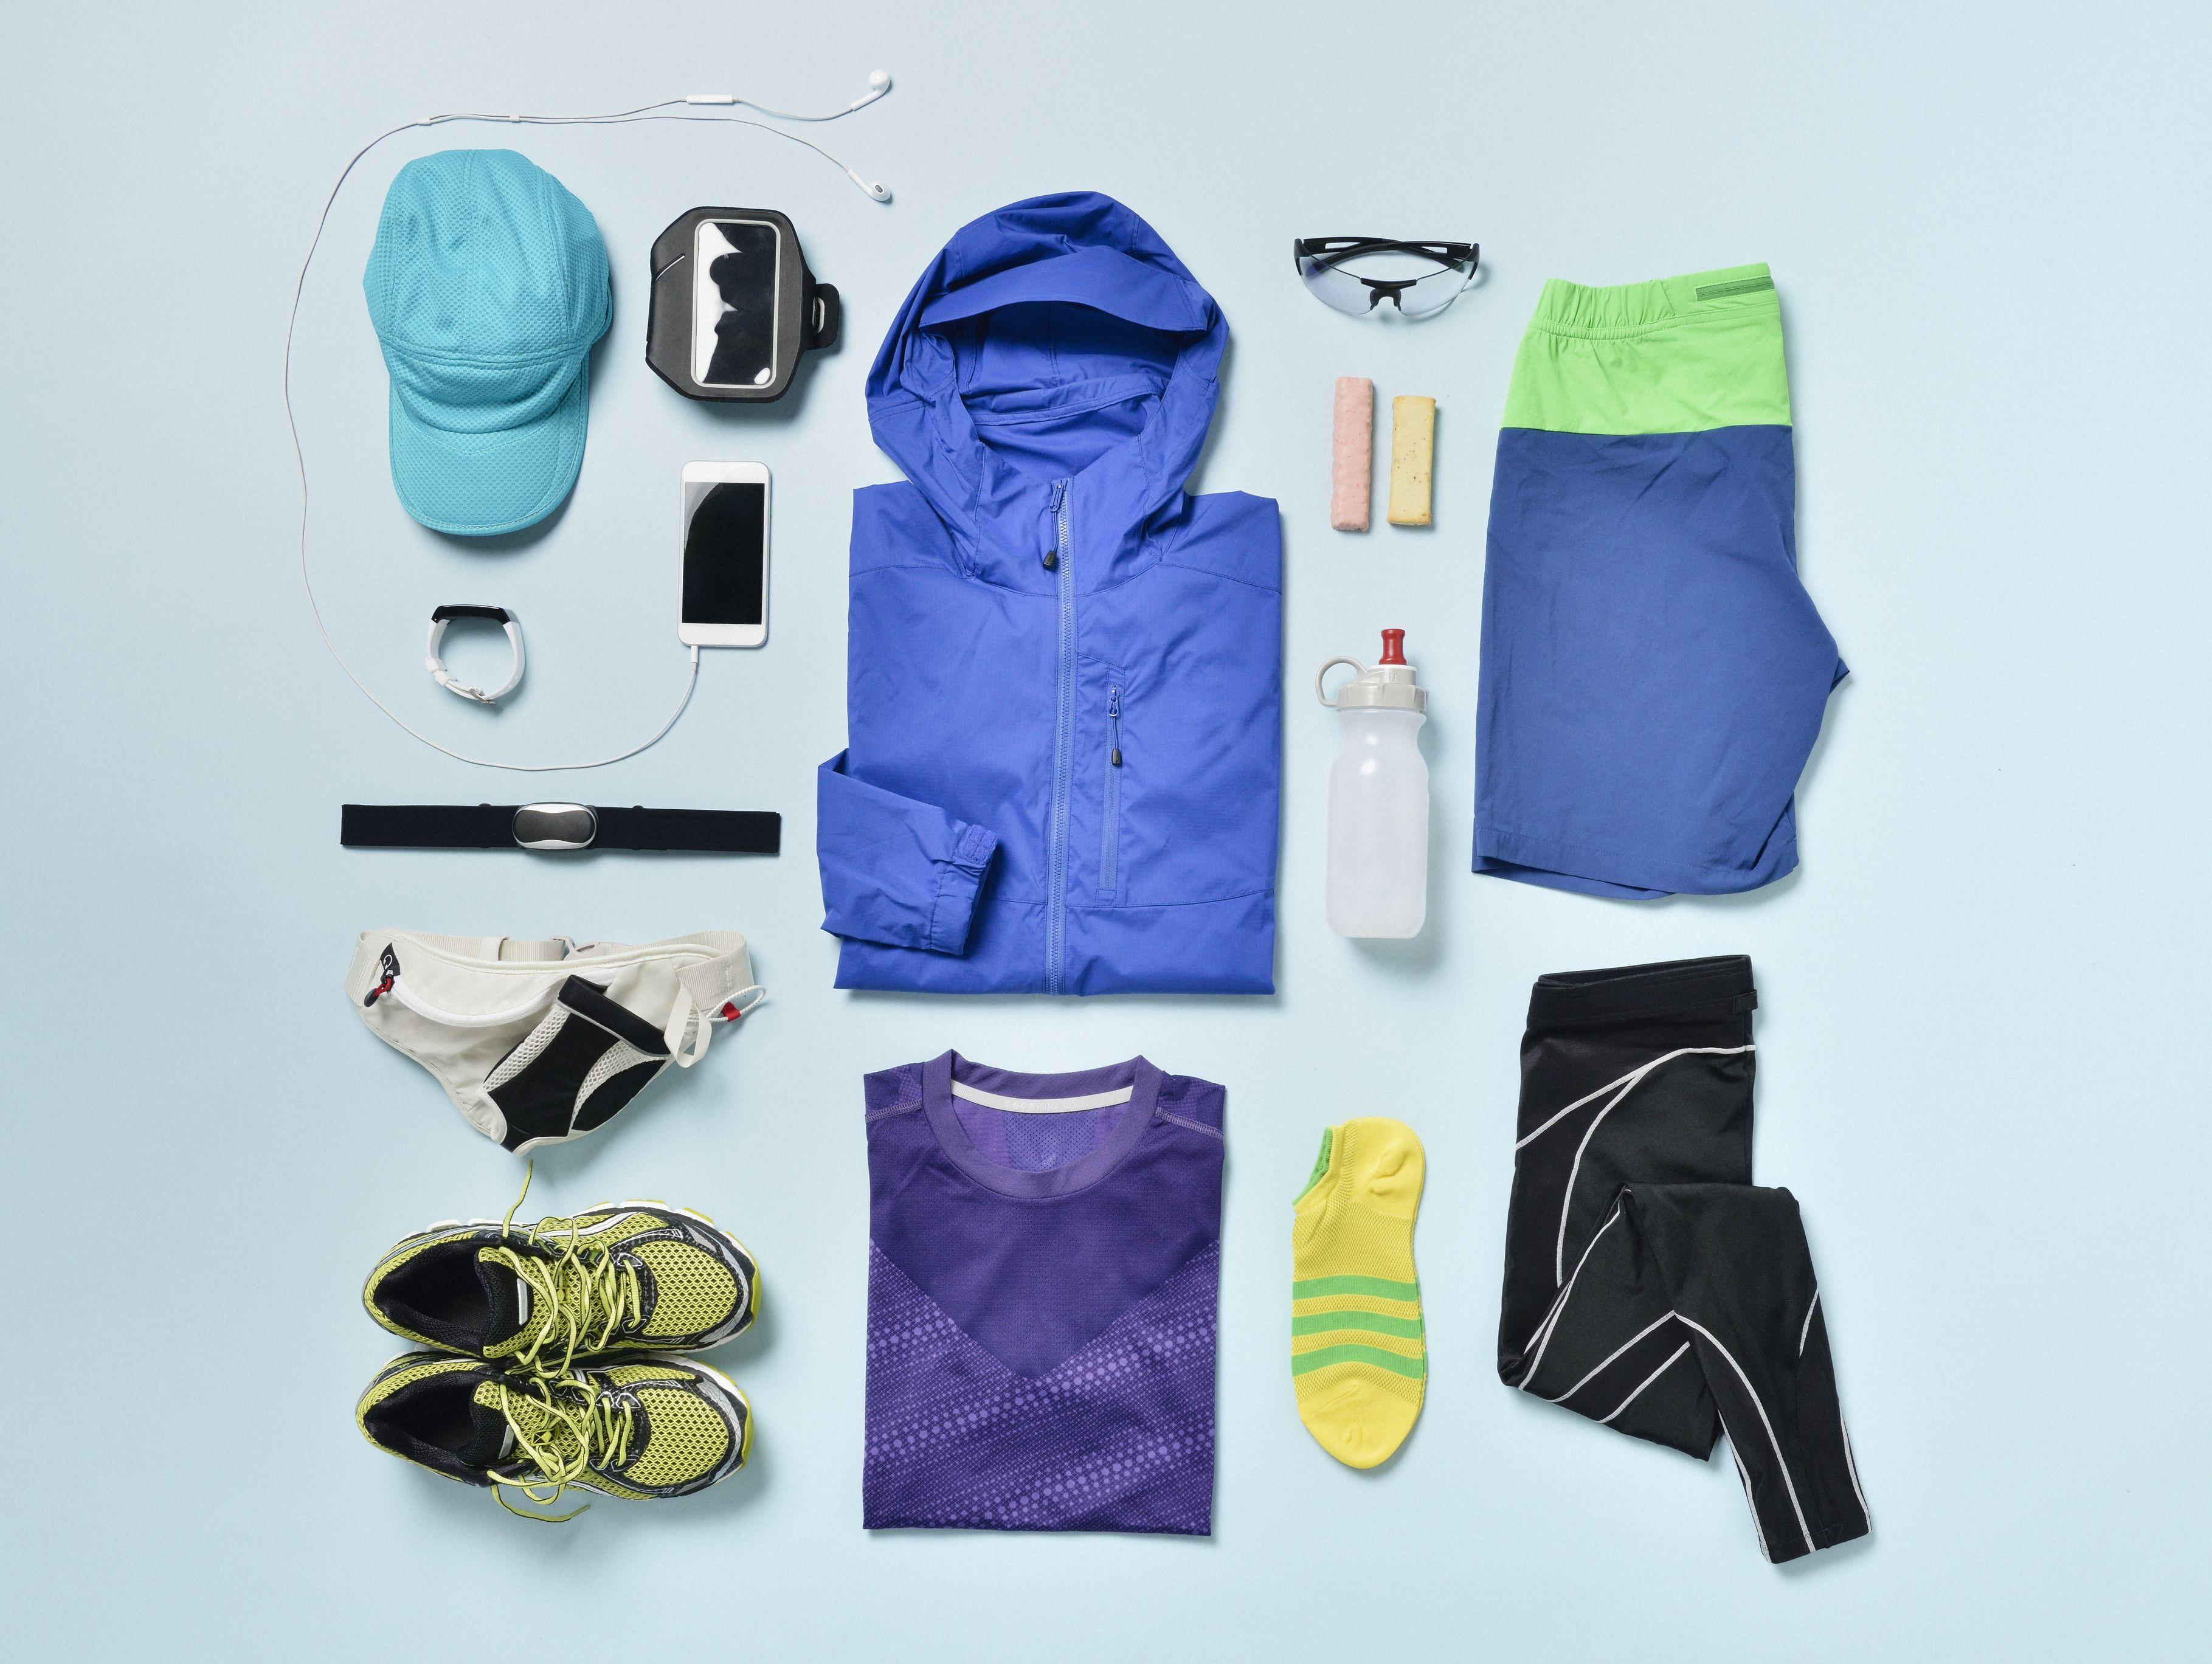 Men's Jogging supplies shot knolling style.